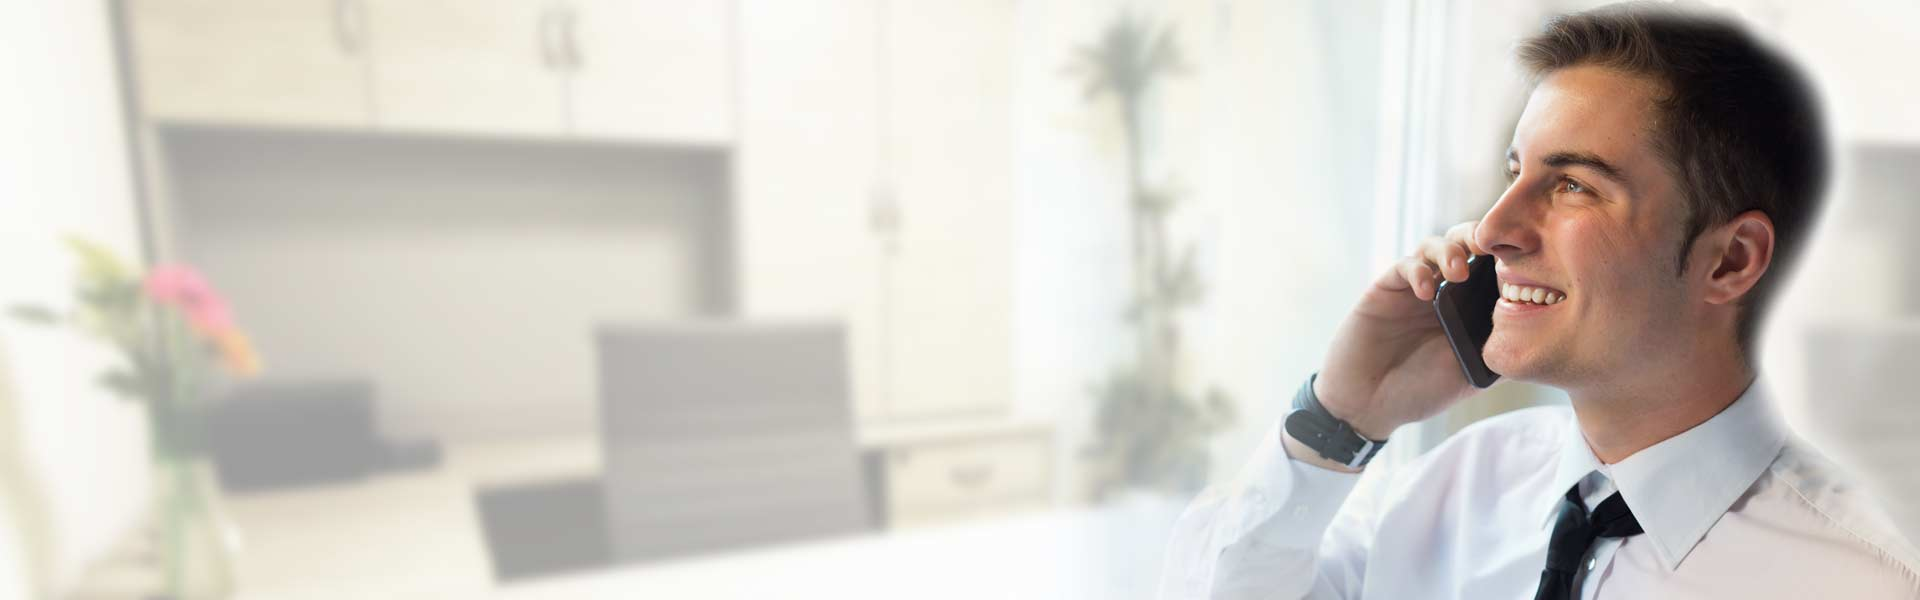 Renta de consultorios por hora df consultorios vidya for Oficinas por horas